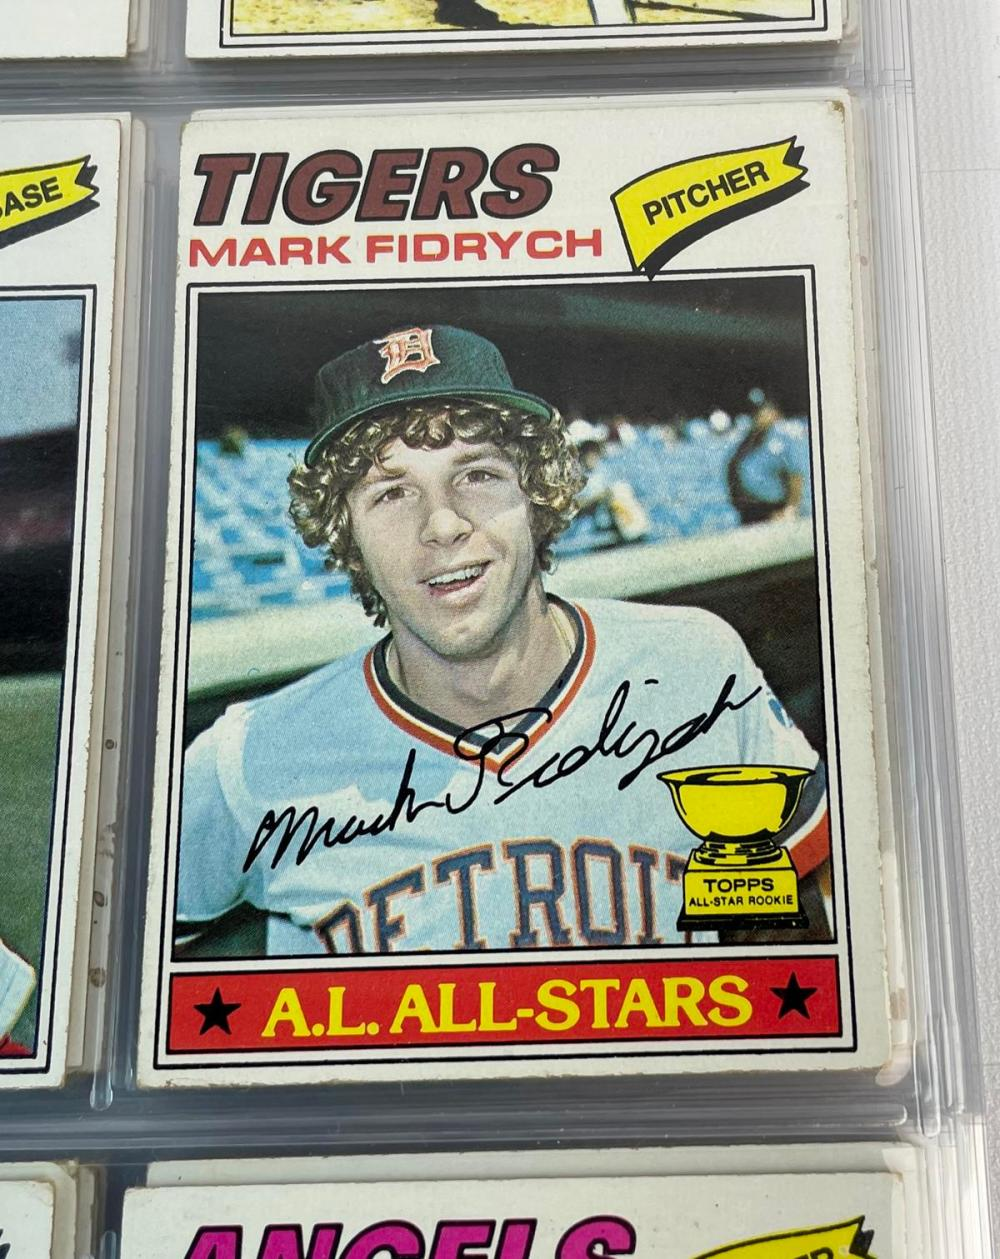 1977 Topps Lot of 189 Baseball Cards (Yaz, Hunter, B. Robinson, Carlton, Stargell, McCovey, Morgan, Etc..)